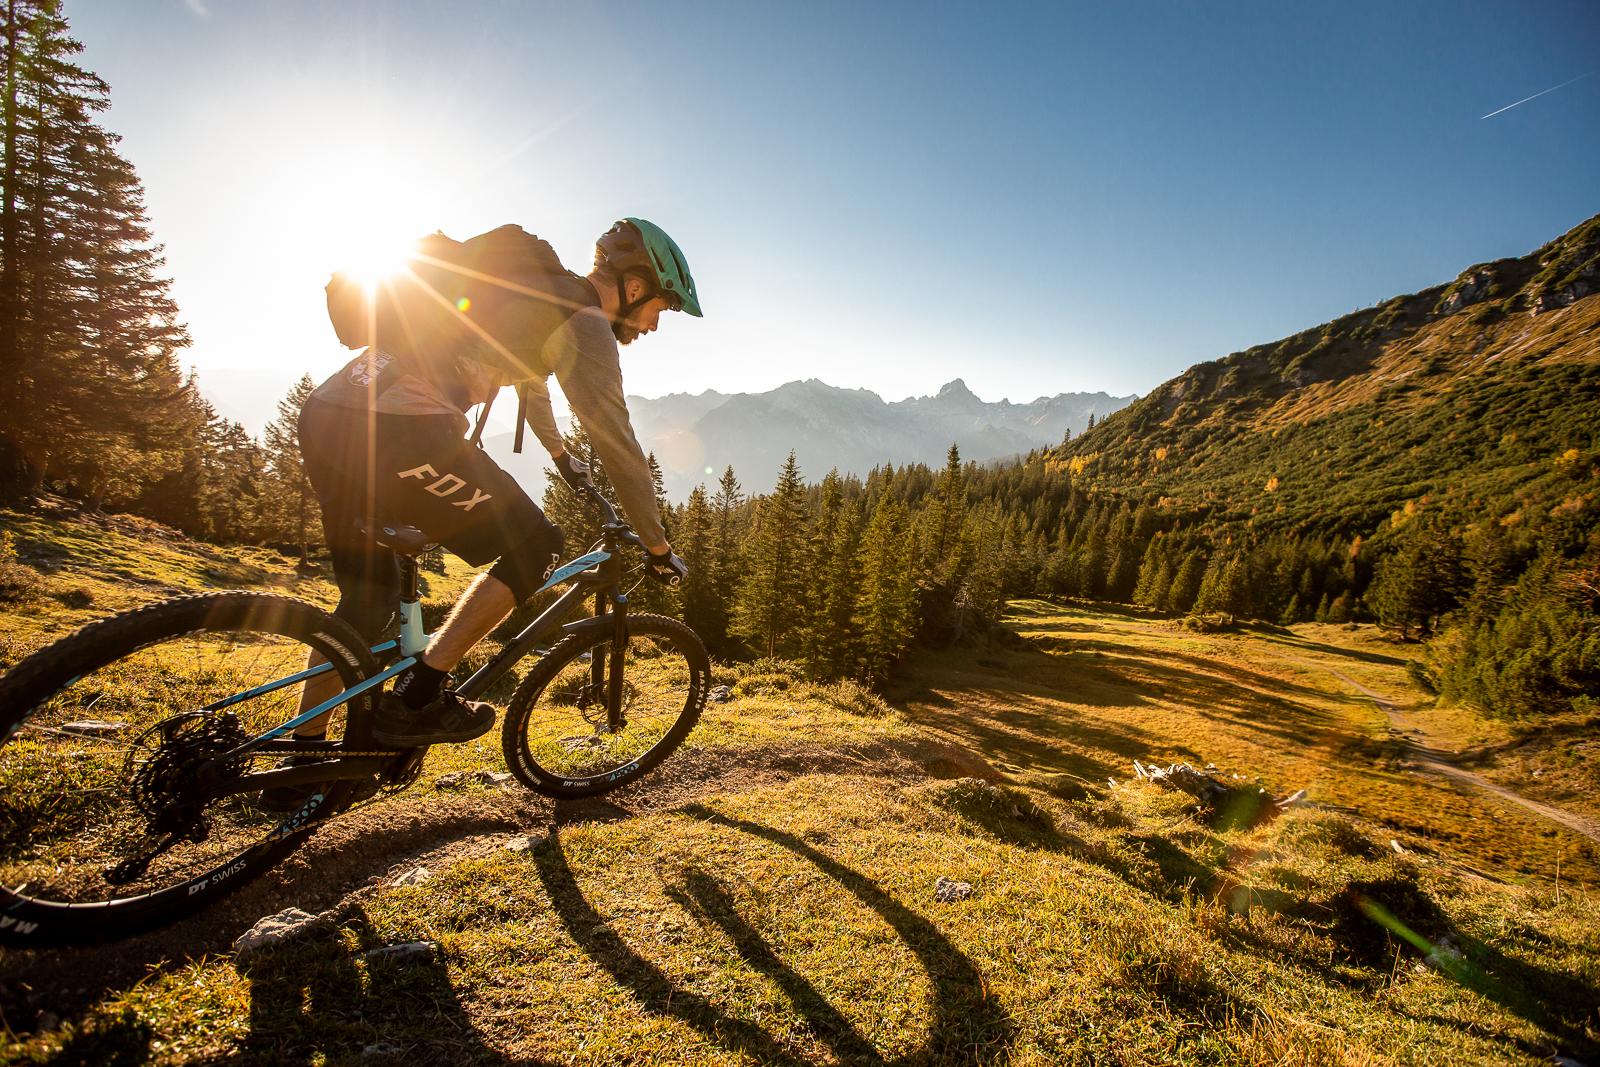 Bikepark Brandnertal Enduro Trails ©Michael Marte